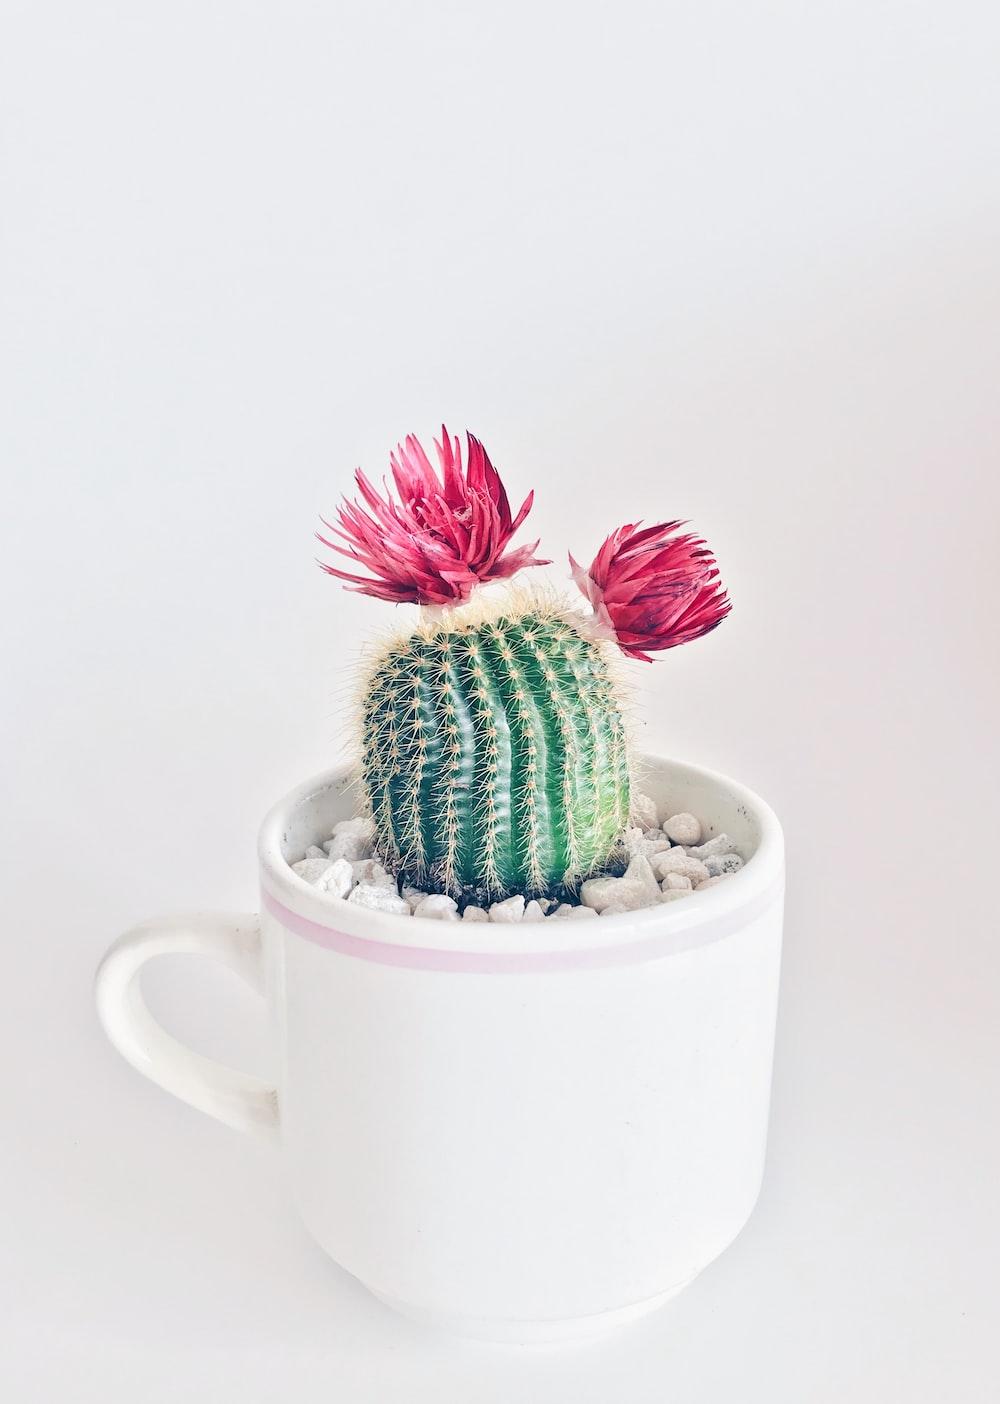 Cactus Wallpapers Free HD Download [20+ HQ]   Unsplash